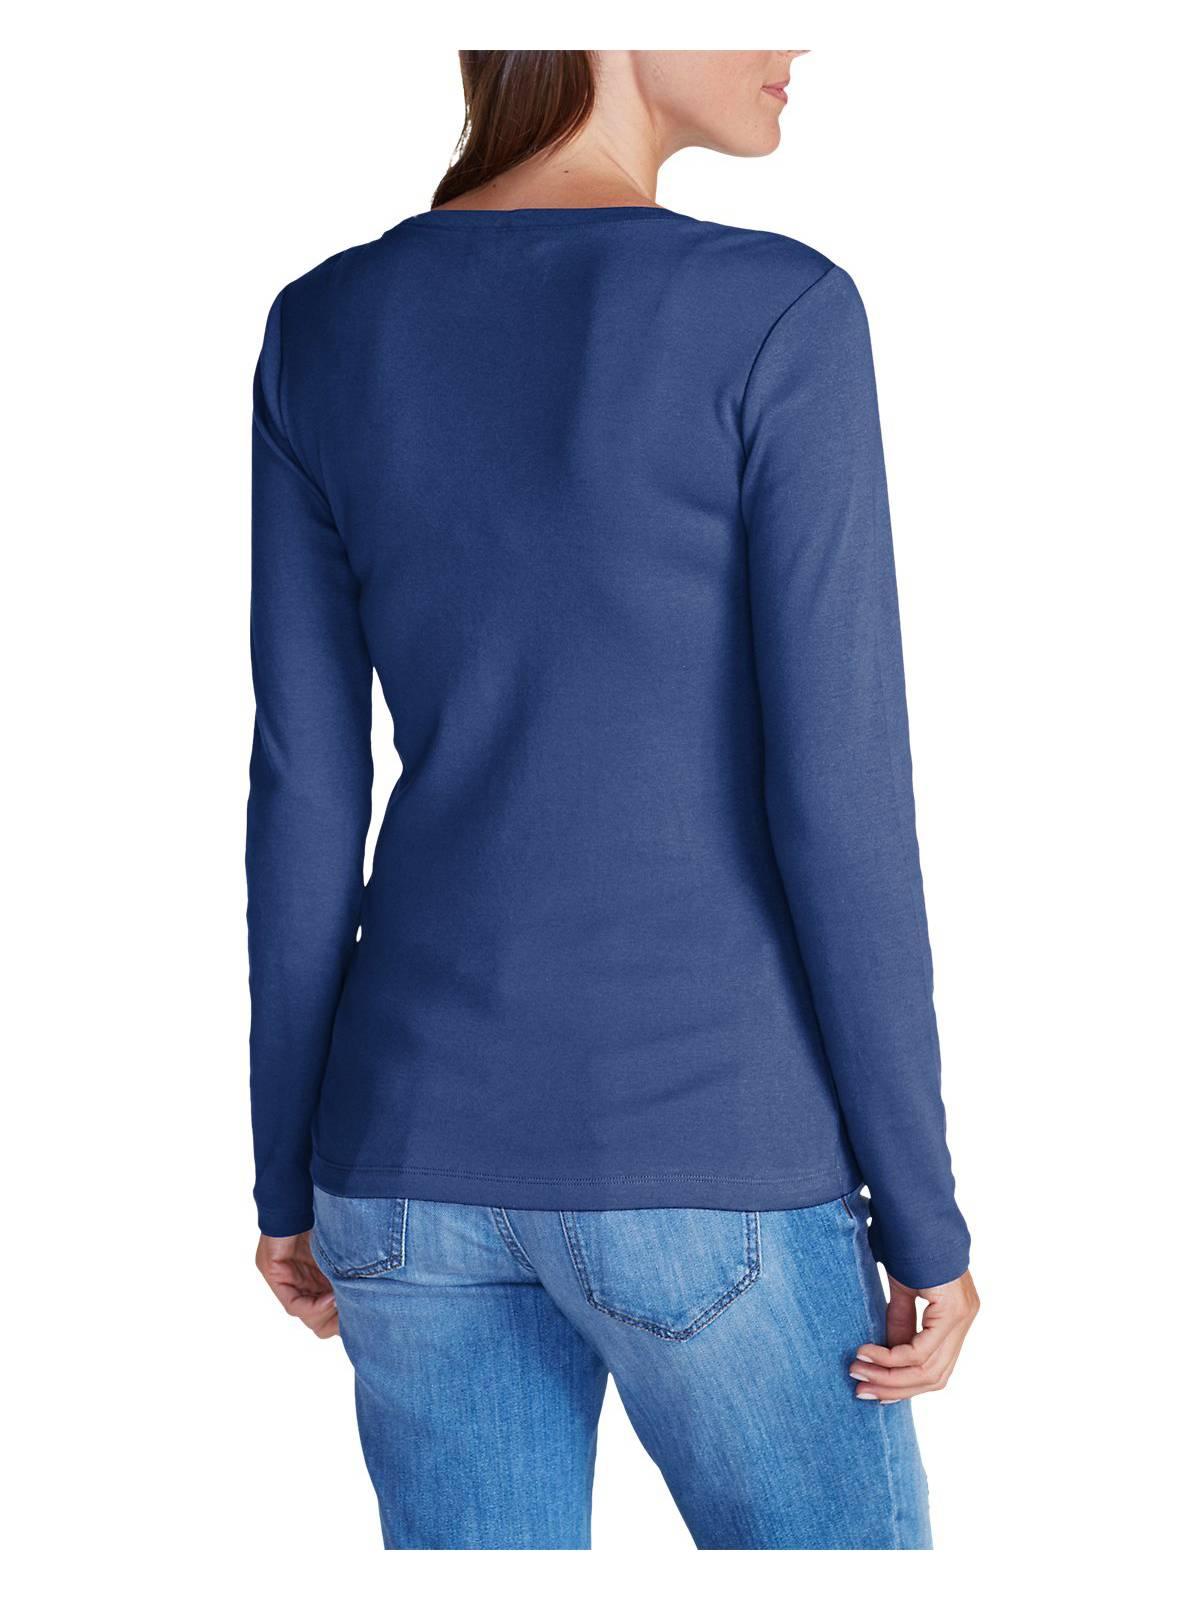 Eddie-Bauer-Women-039-s-Favorite-Long-Sleeve-V-Neck-T-Shirt thumbnail 13